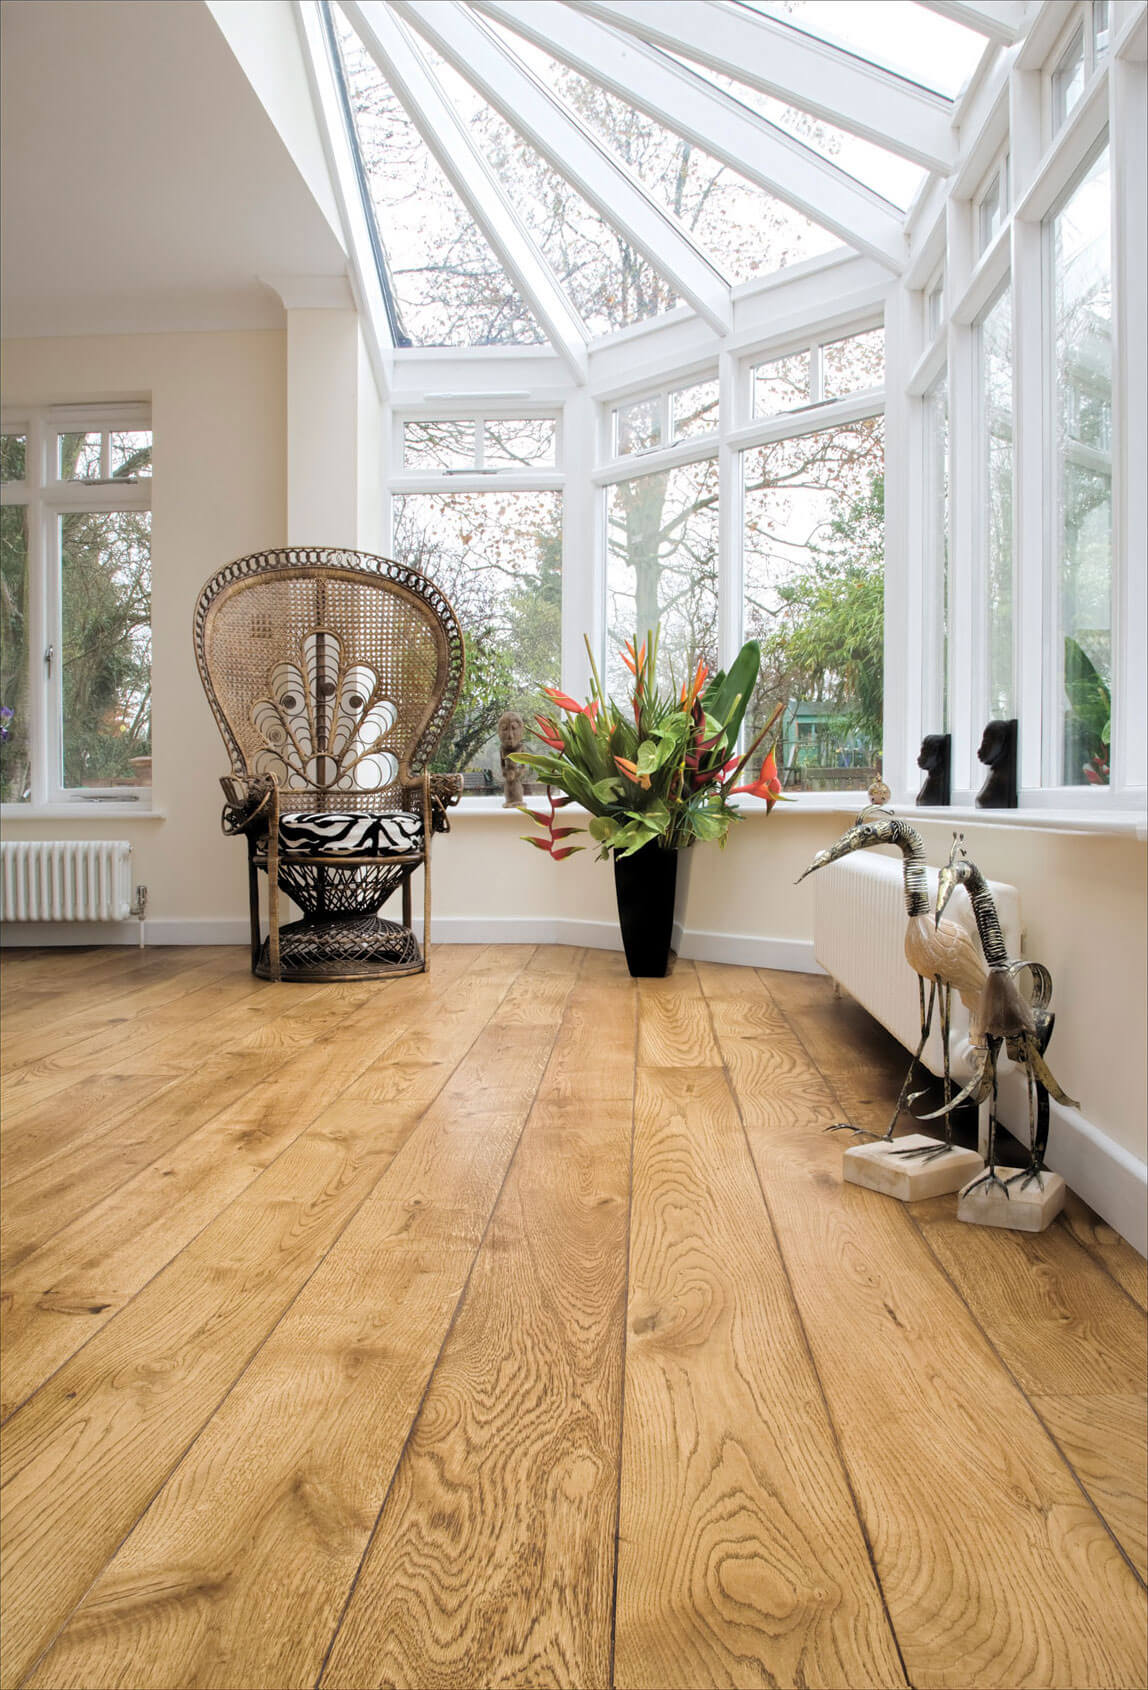 Conservatory Flooring Ideas - Solid Wood or Engineered Wooden Flooring